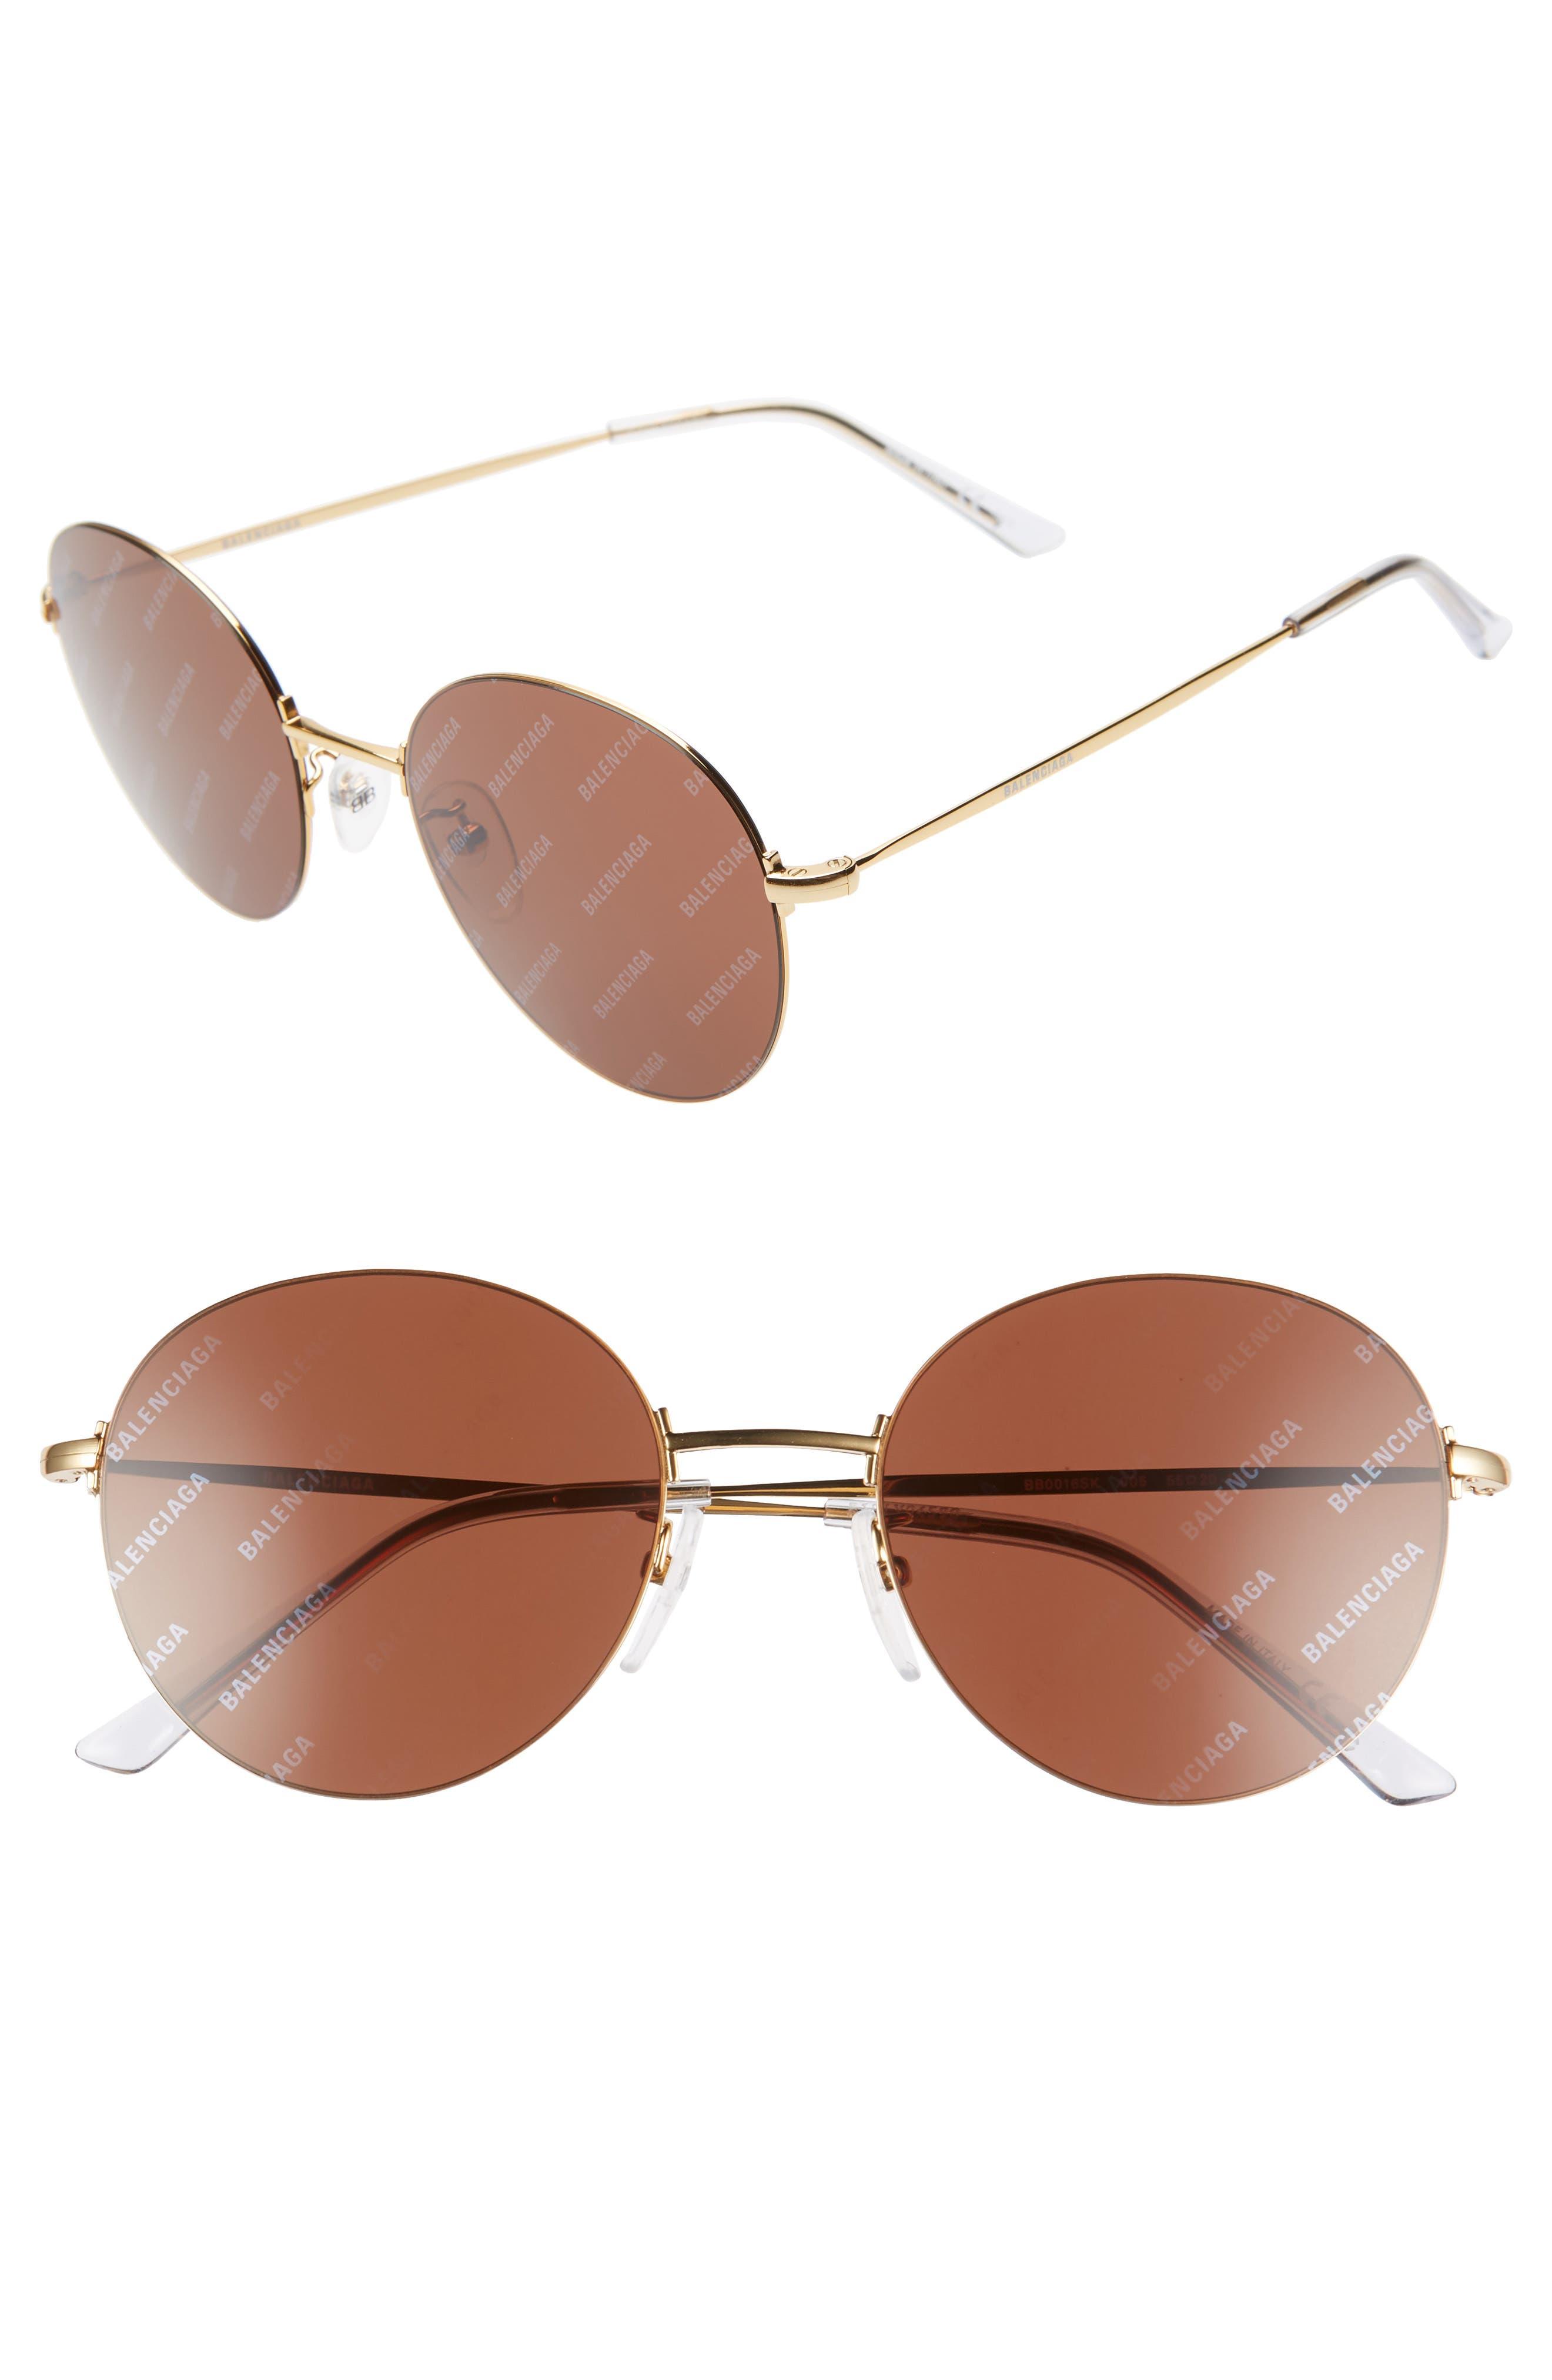 BALENCIAGA 55mm Round Sunglasses, Main, color, SHINY ENDURA GOLD/ BROWN